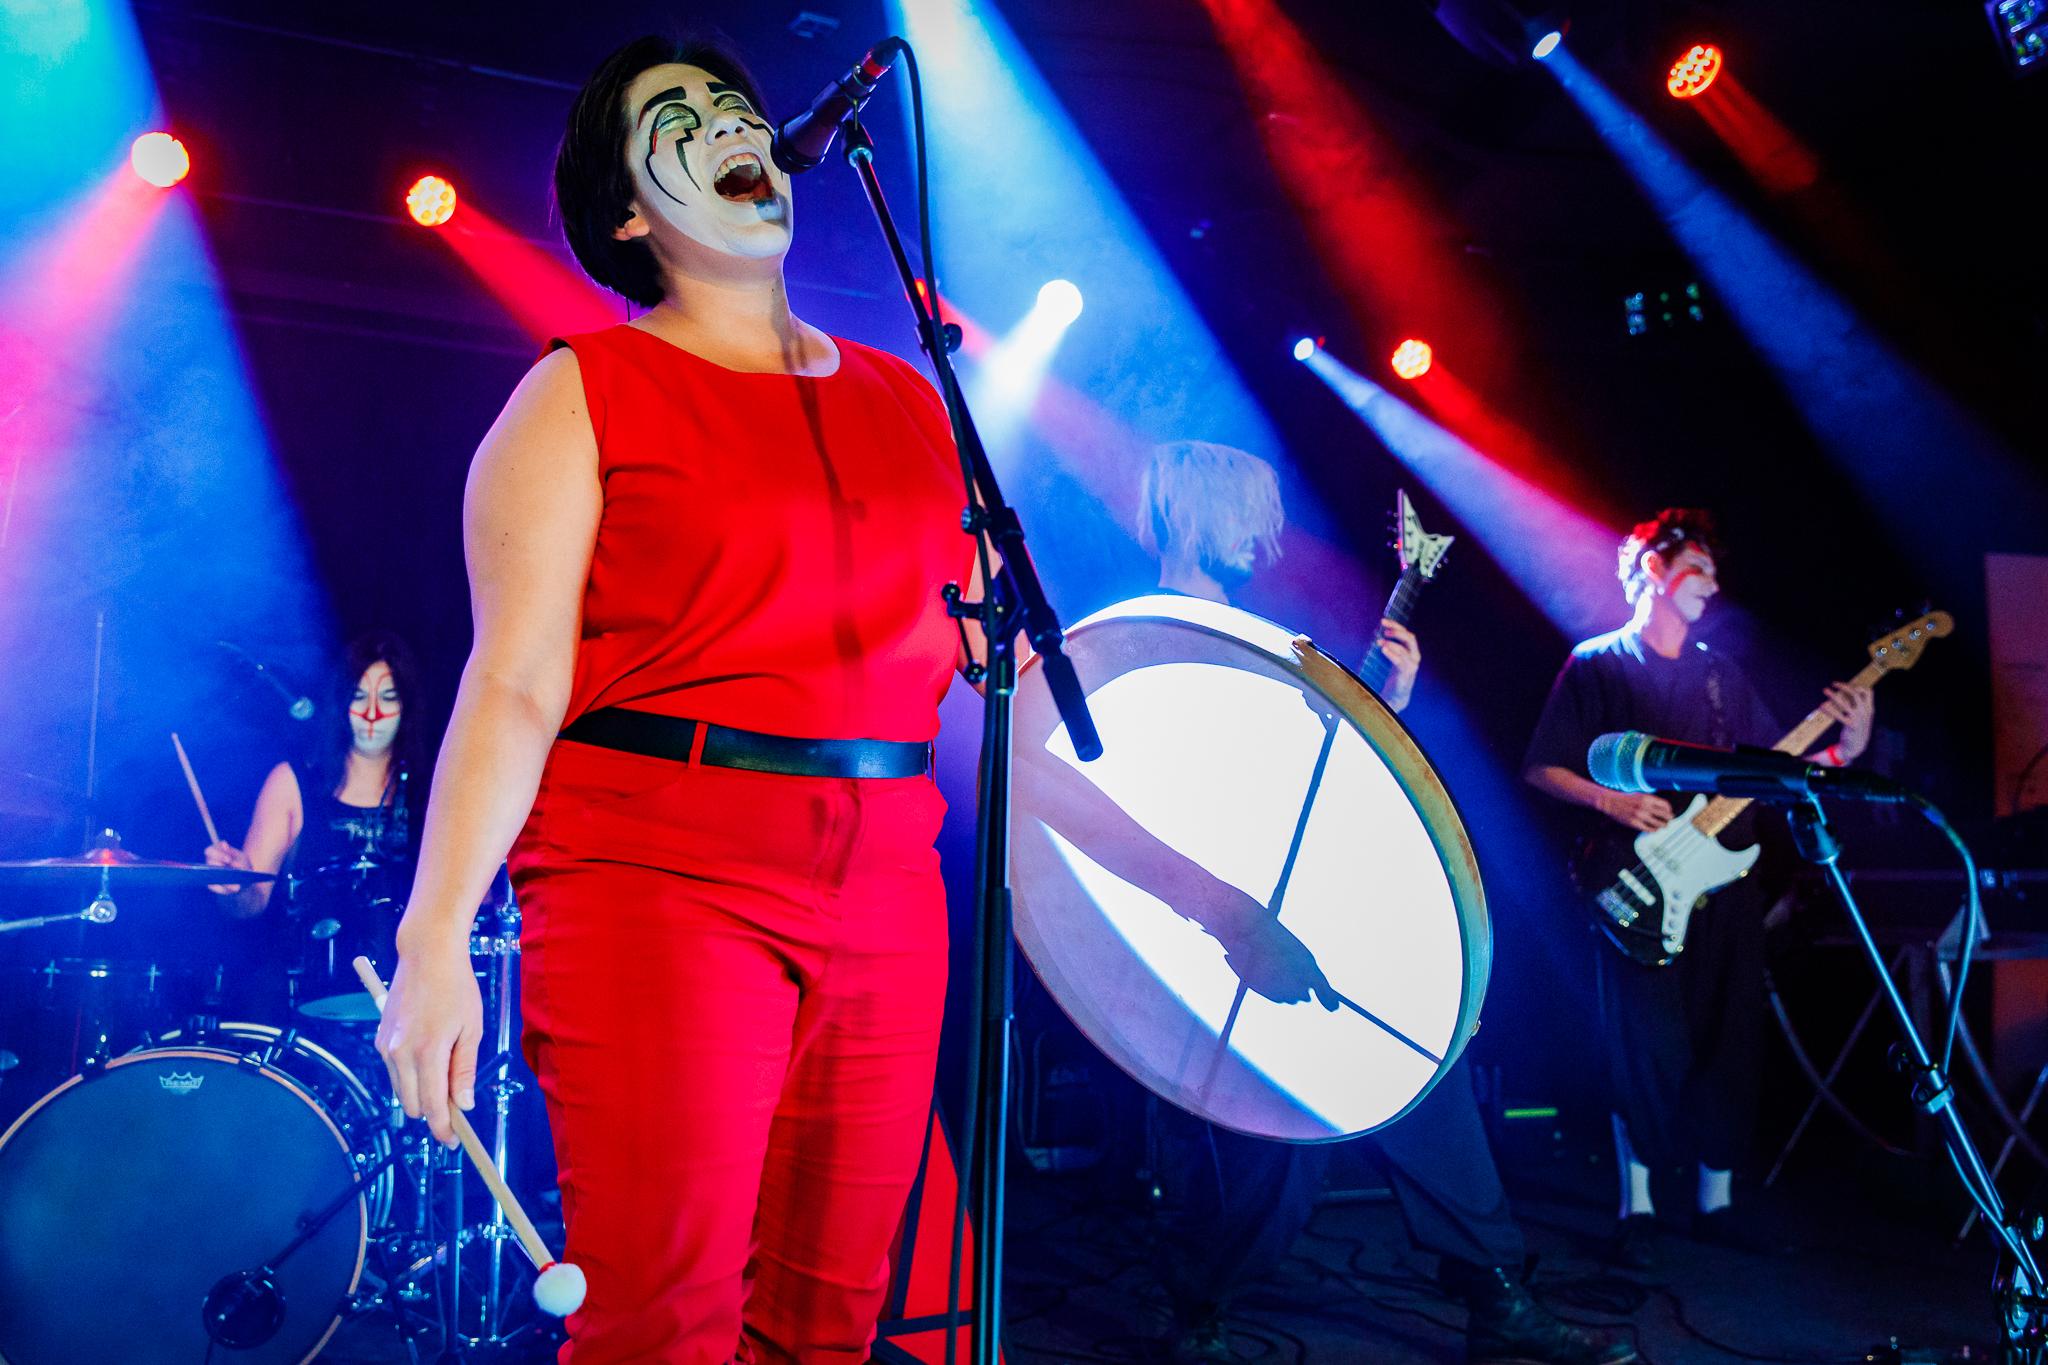 Yamantaka // Sonic Titan performing at Union Stage in Washington, DC - 3/20/2018 (photo by Matt Condon / @arcane93)